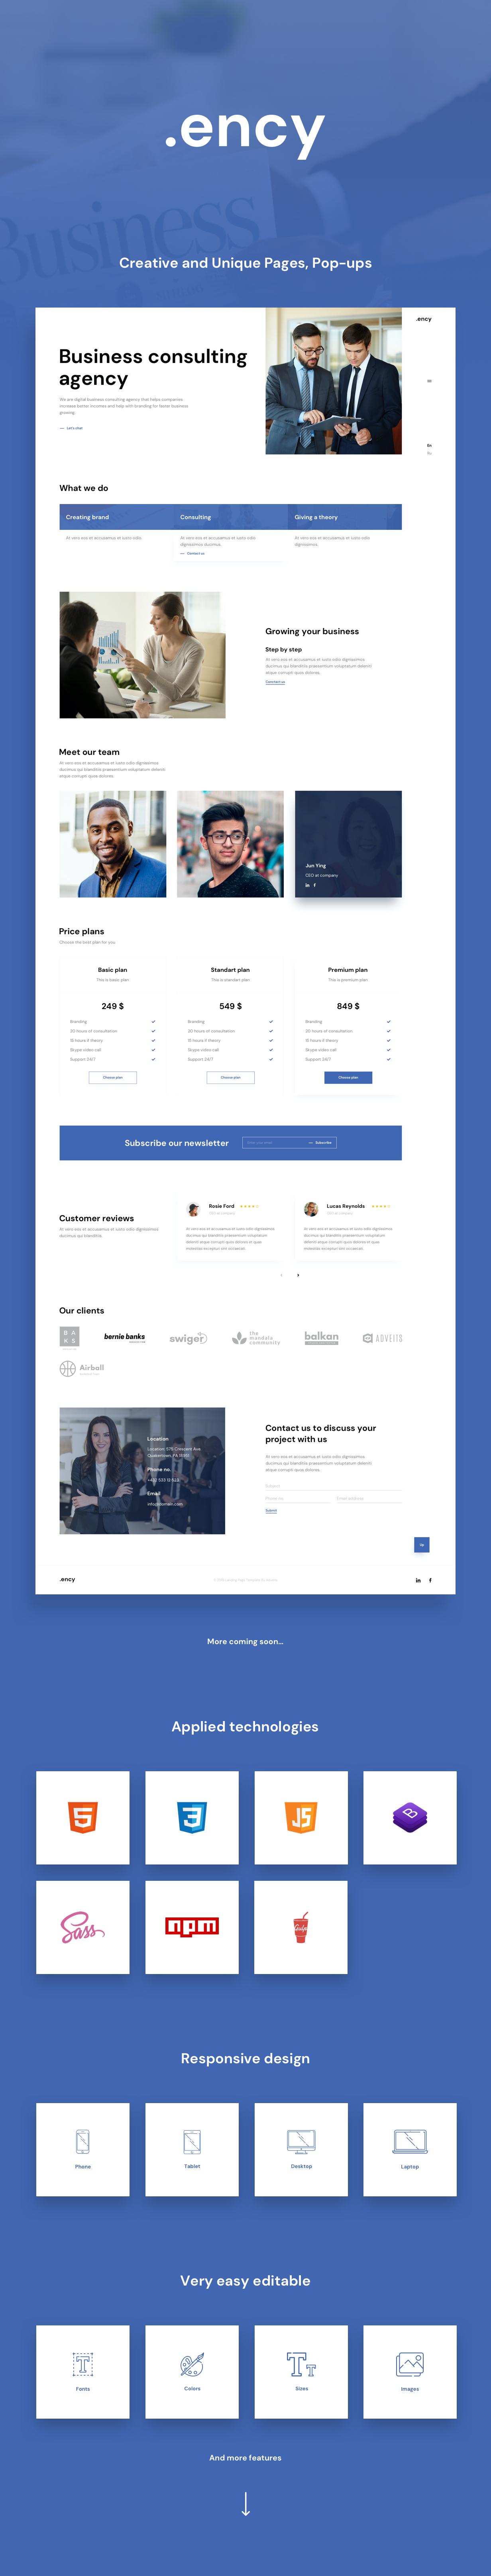 Ency Landing Page Presentation